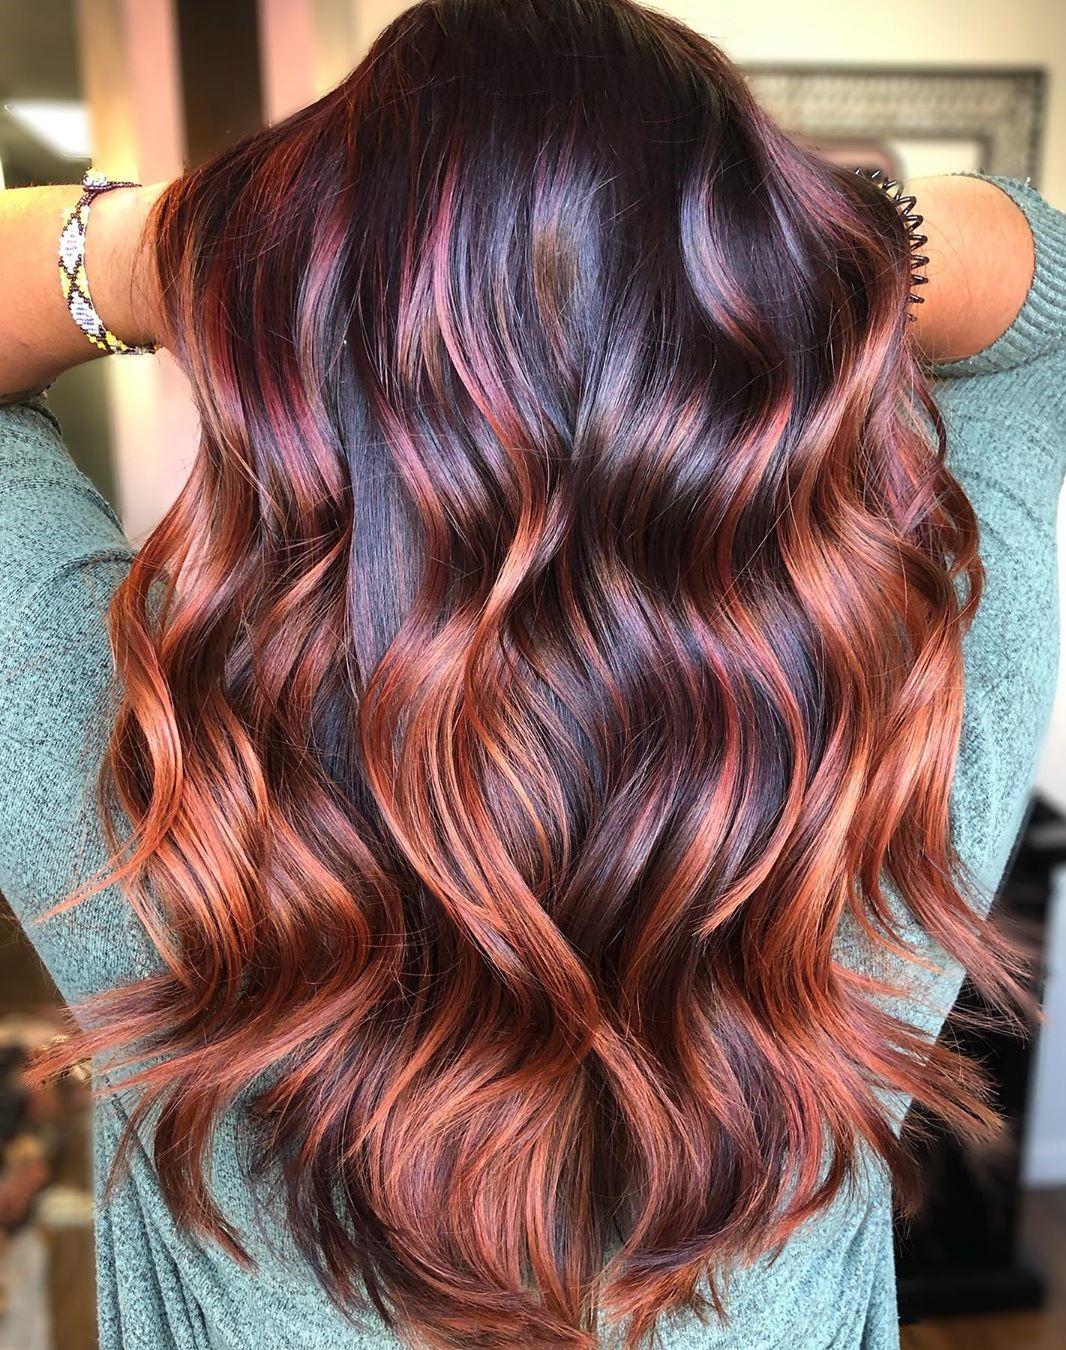 Dark Hair with Auburn Balayage